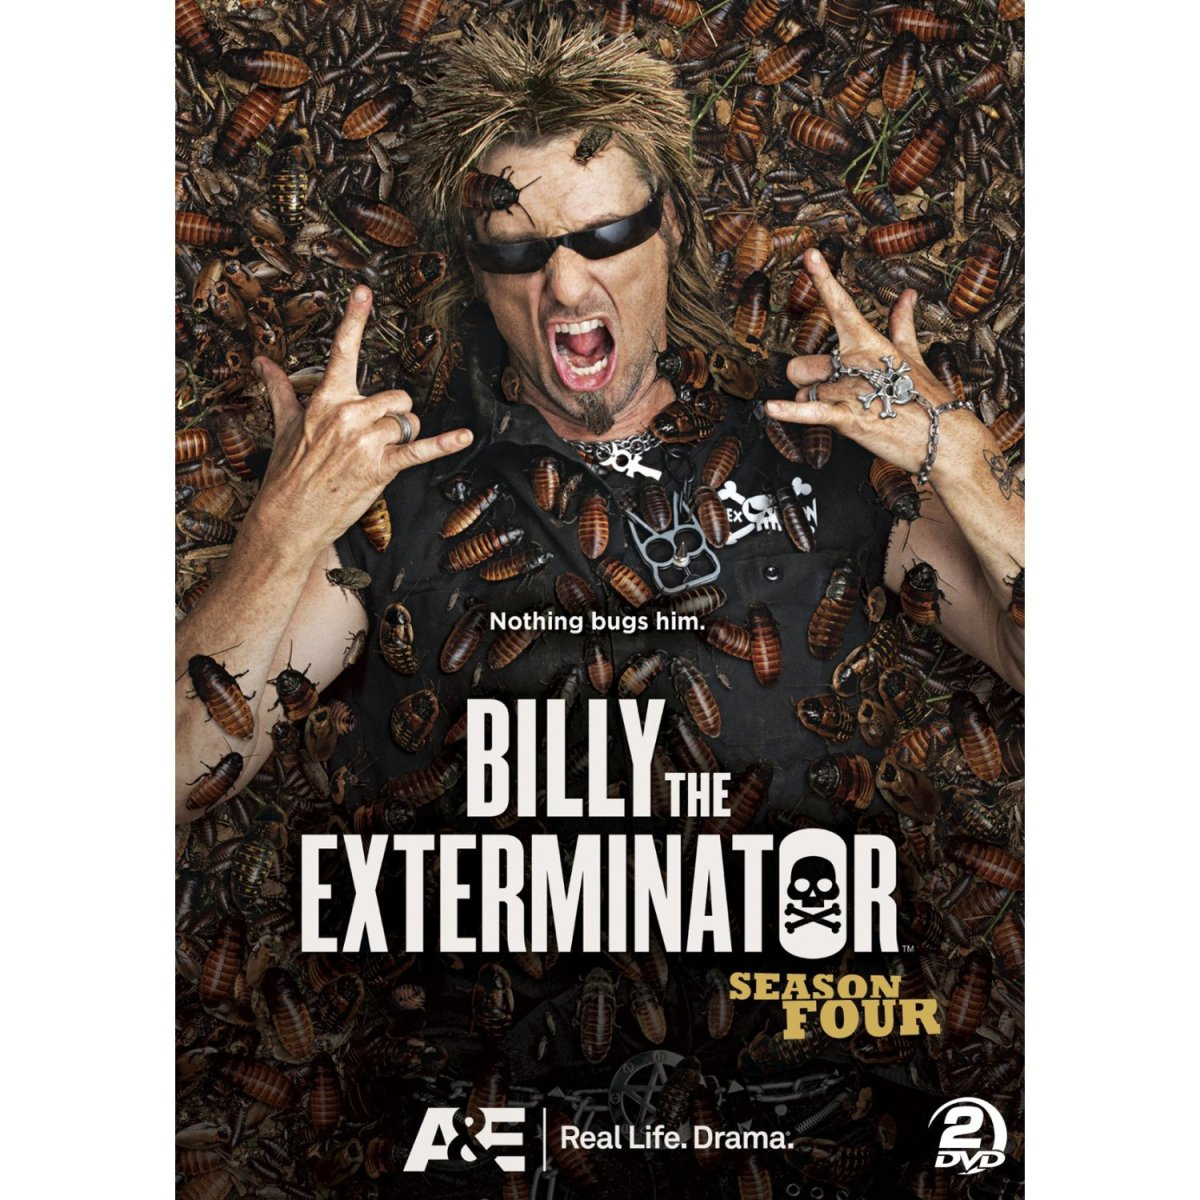 Billy the Exterminator: Season Four – DVD Review